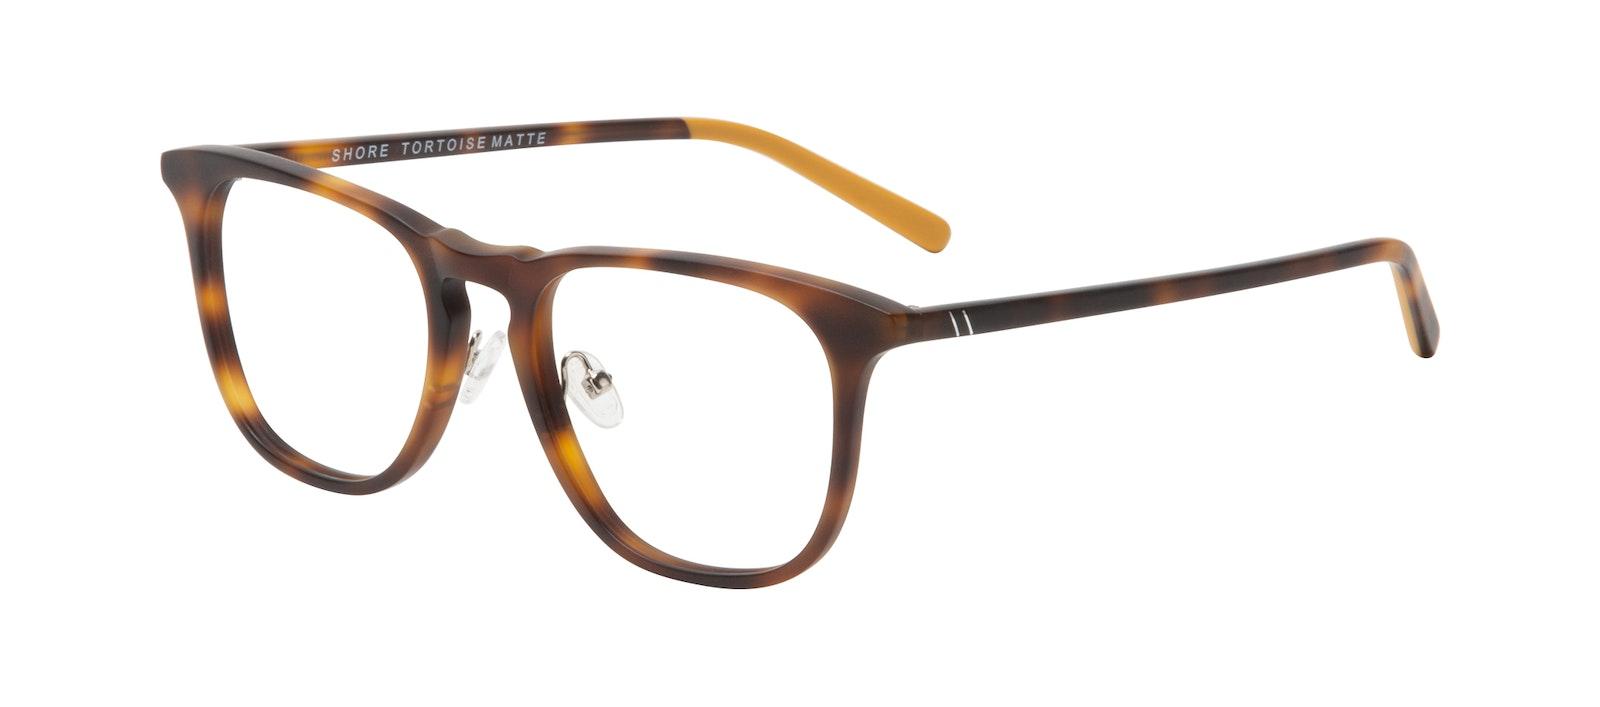 Affordable Fashion Glasses Square Eyeglasses Men Shore Tortoise Matte Tilt